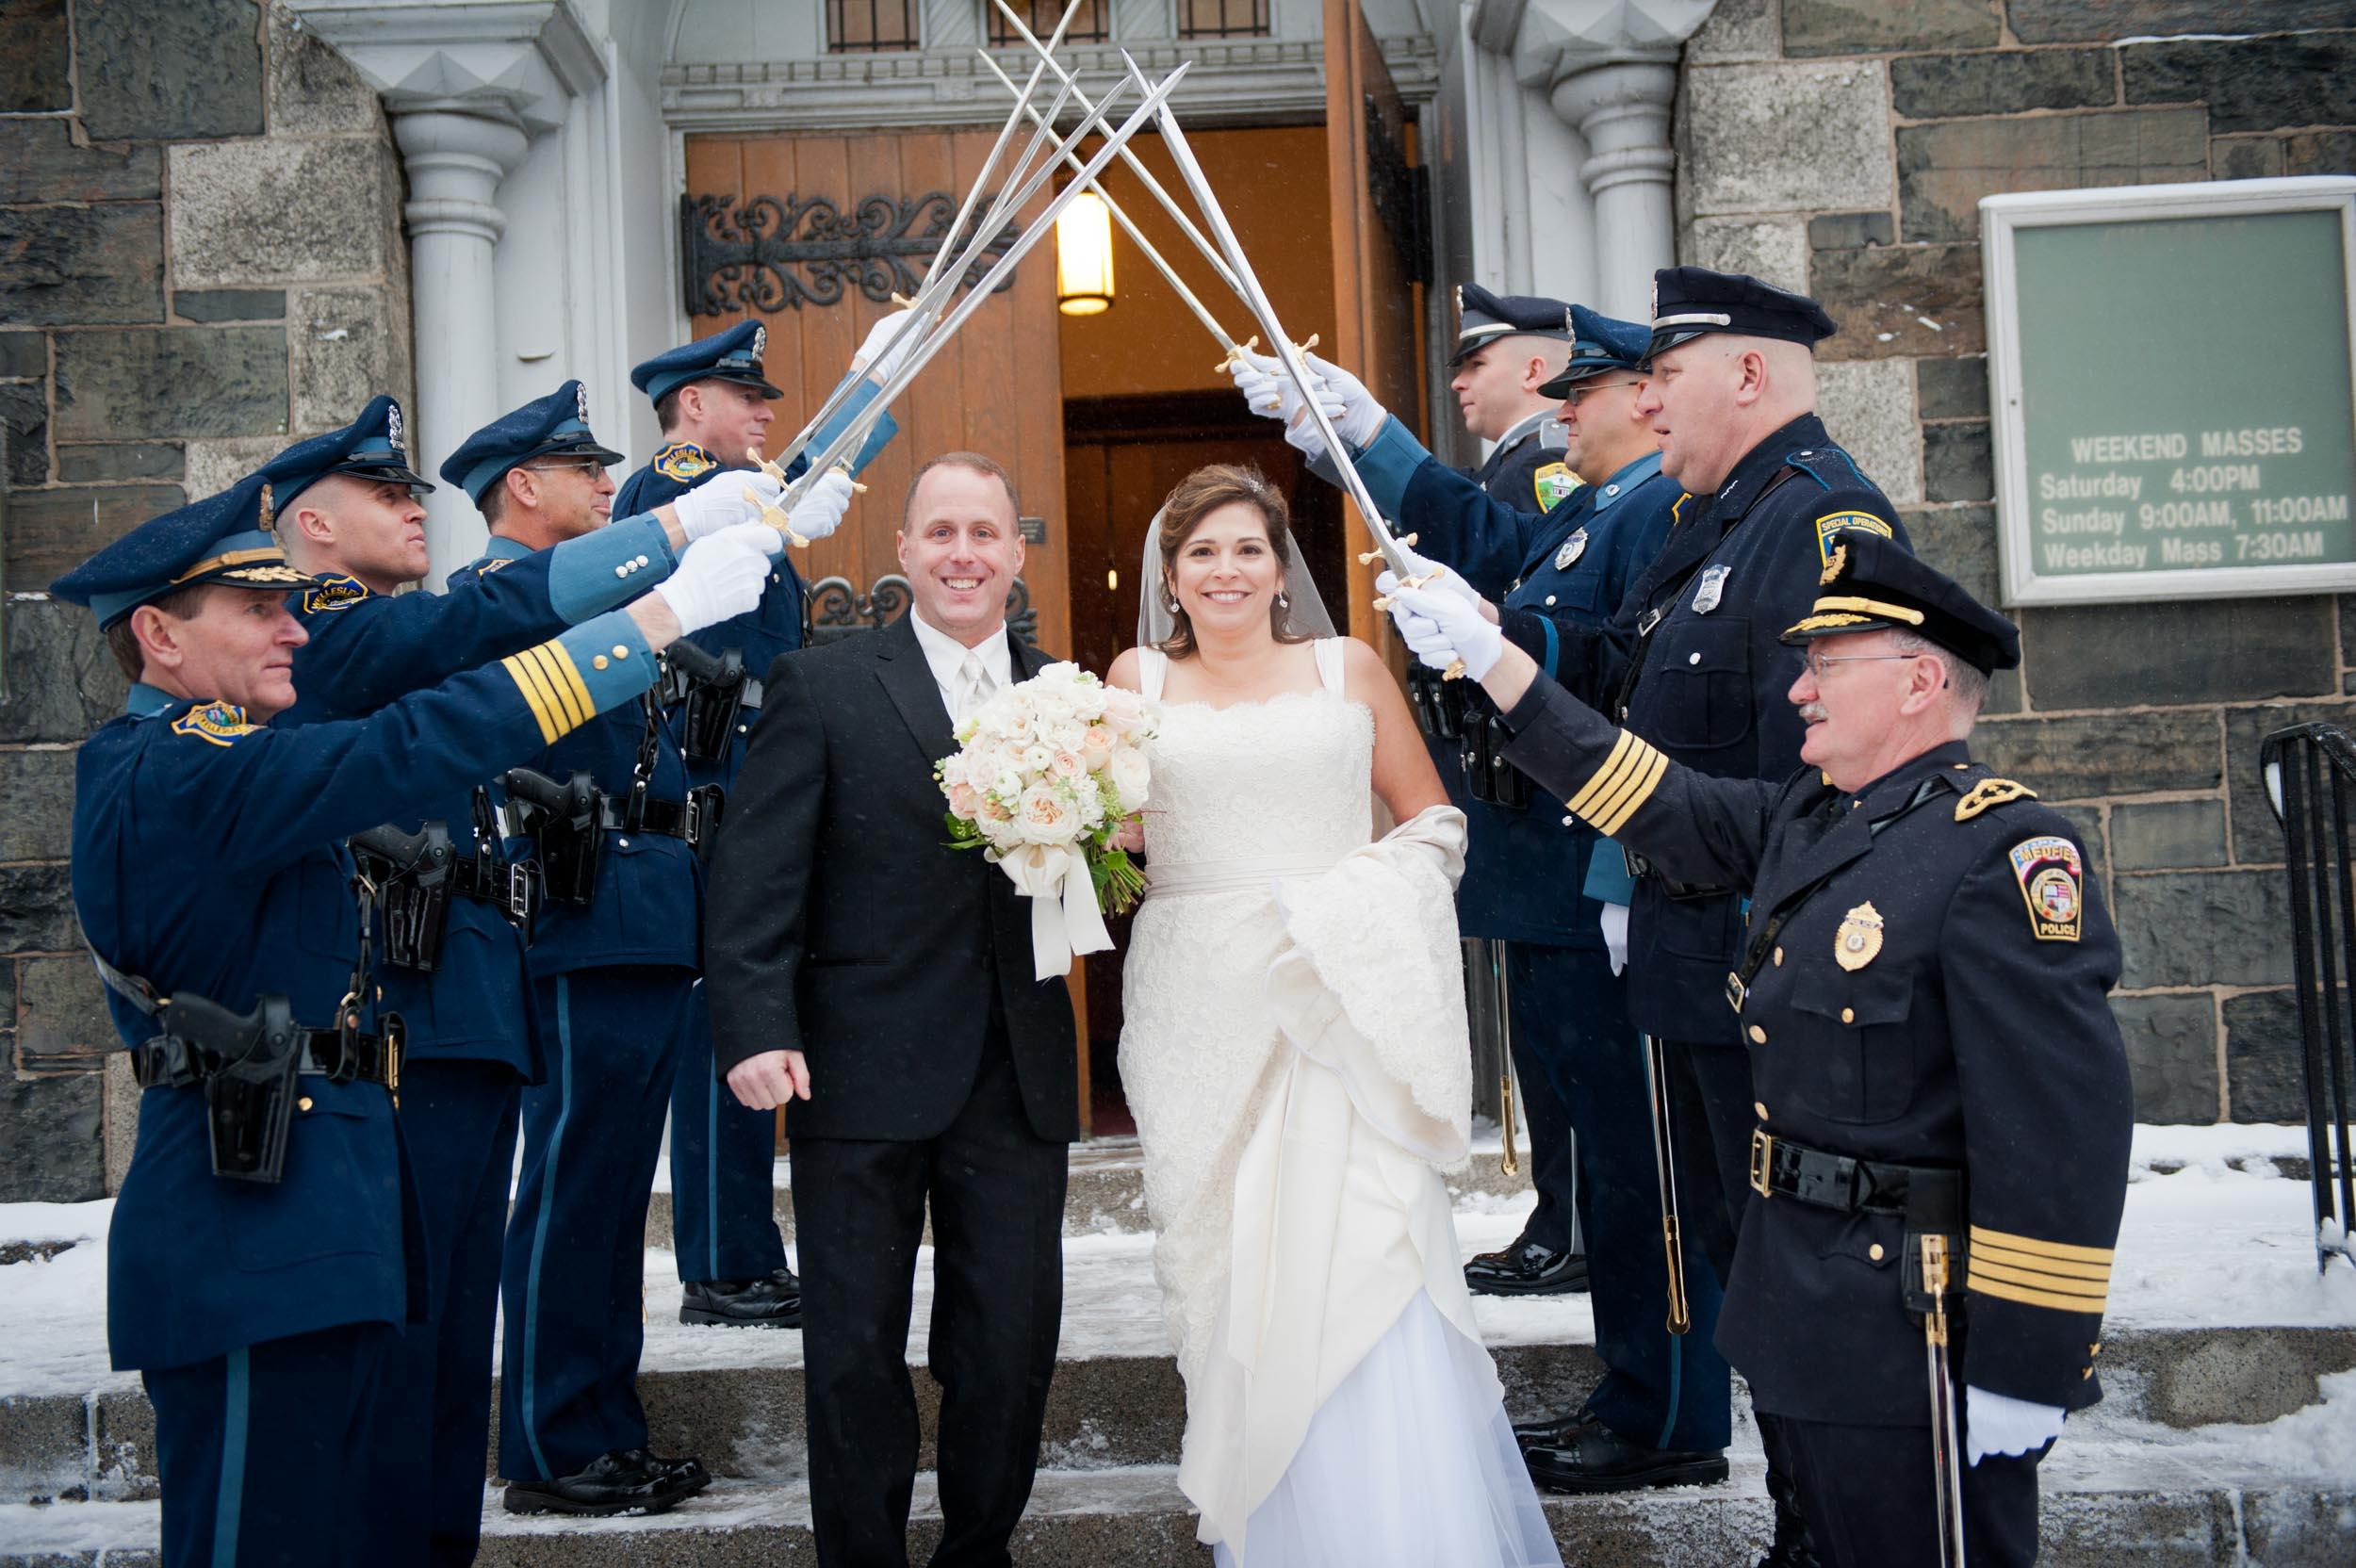 Wedding64Whittemore-350-2.jpg